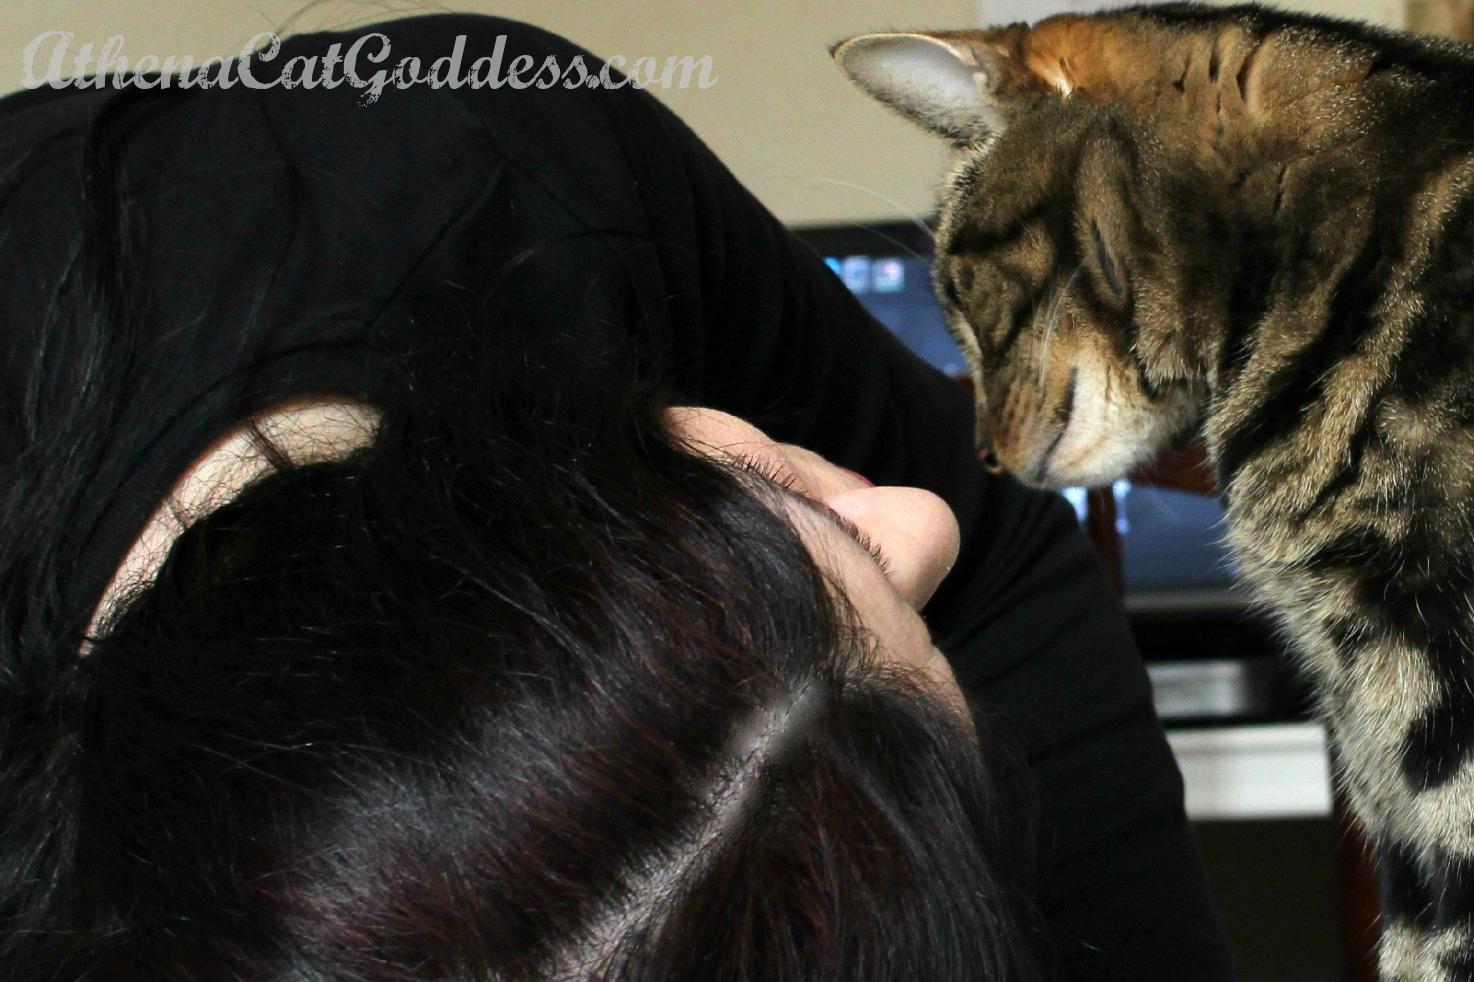 cat and human bond